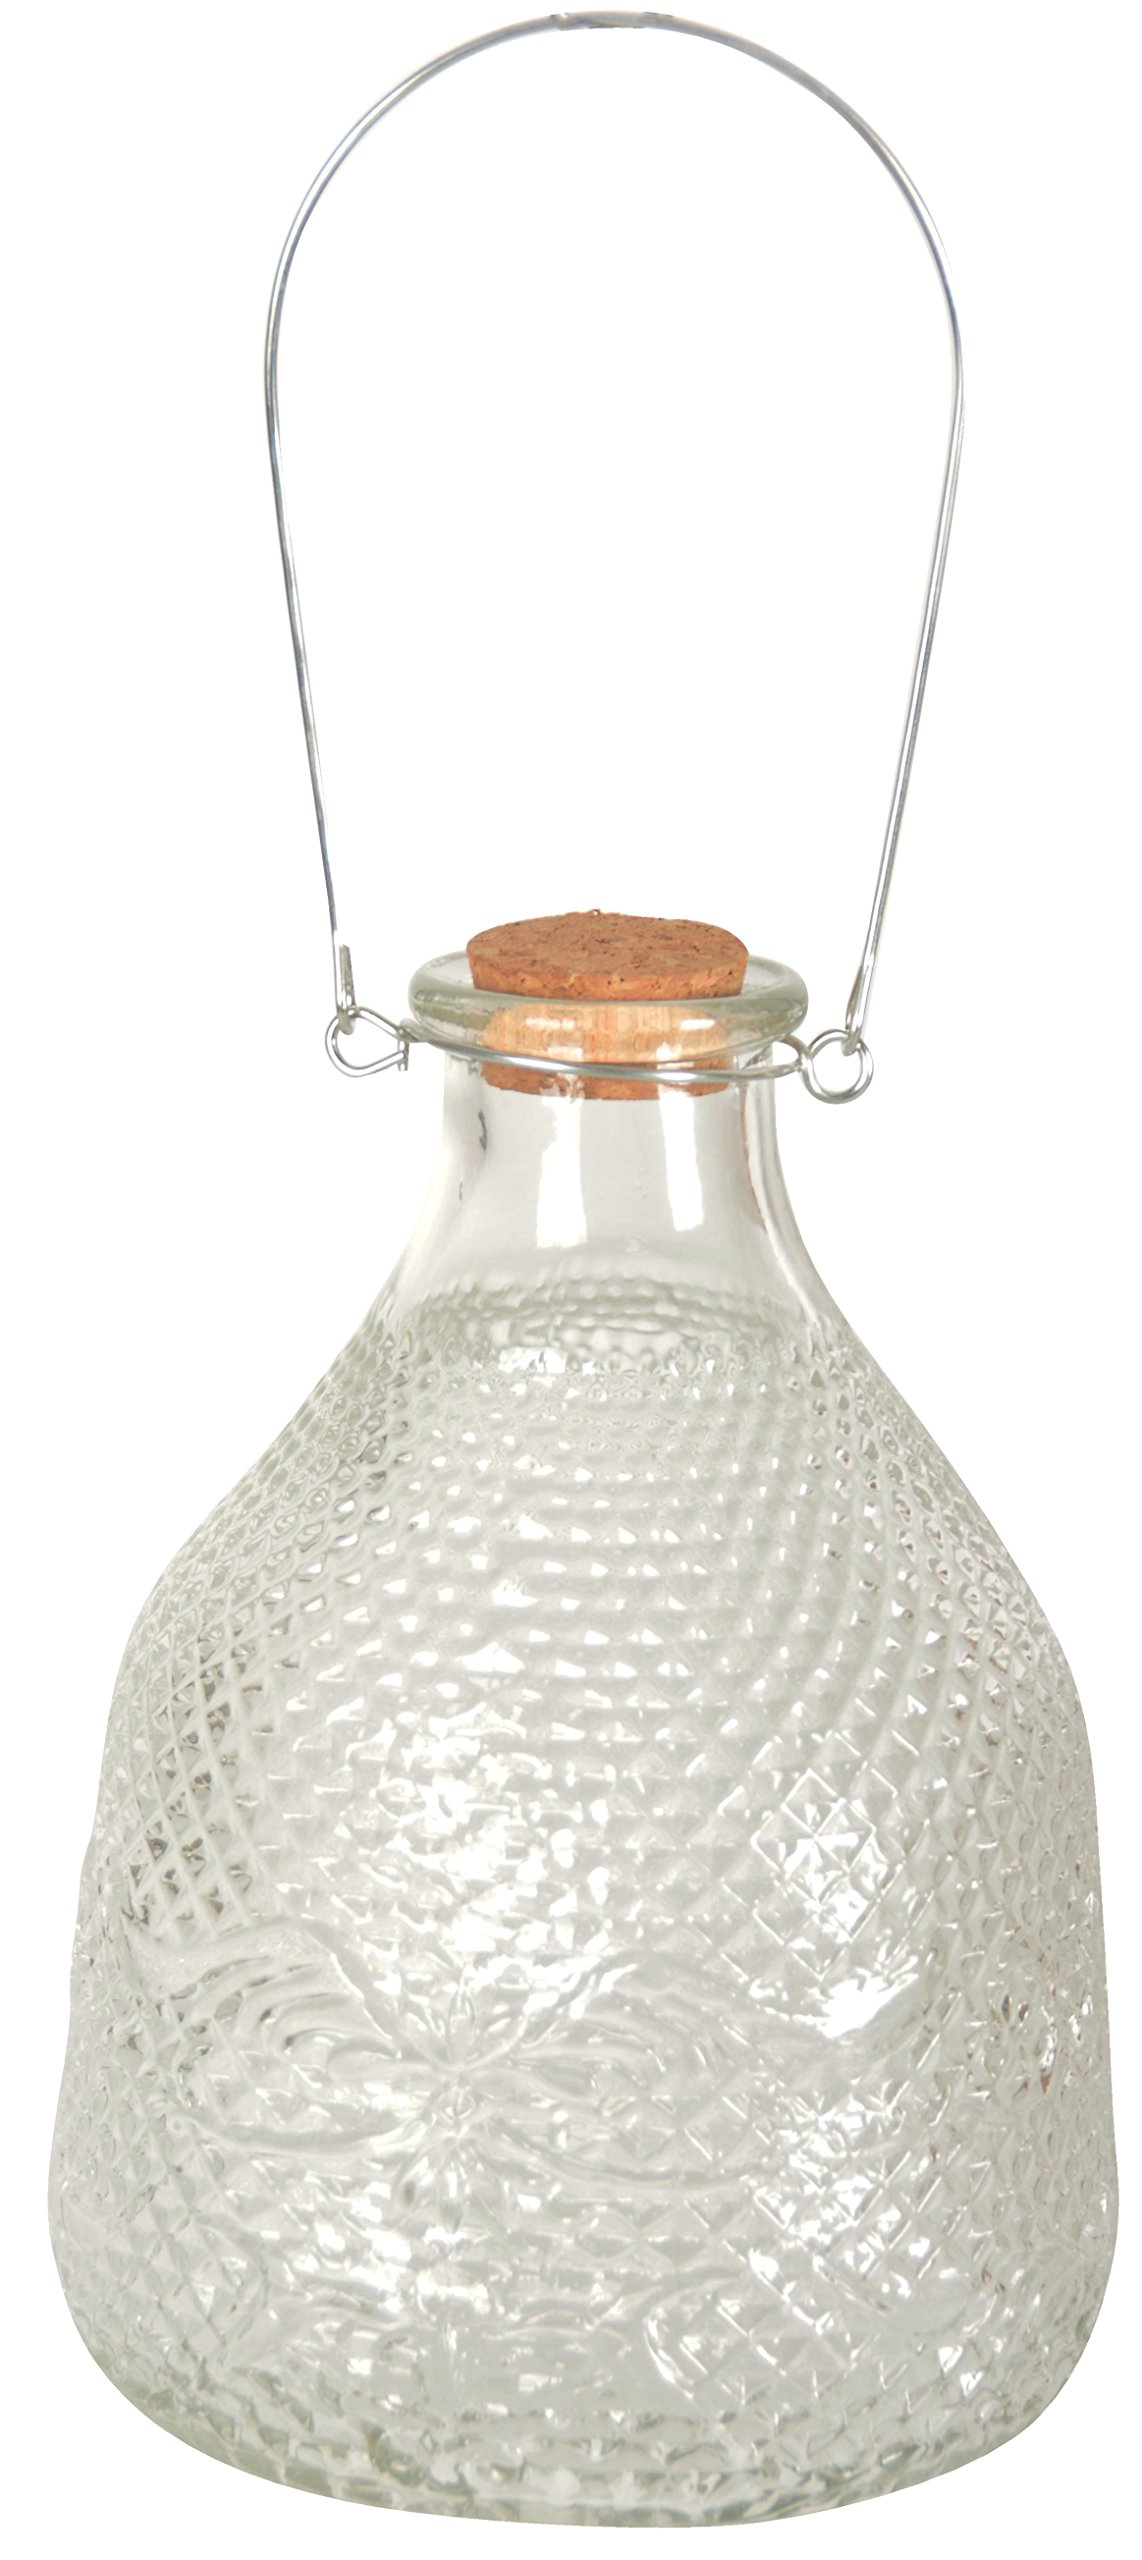 Esschert Design Wasp Trap Hobnail Glass, Large